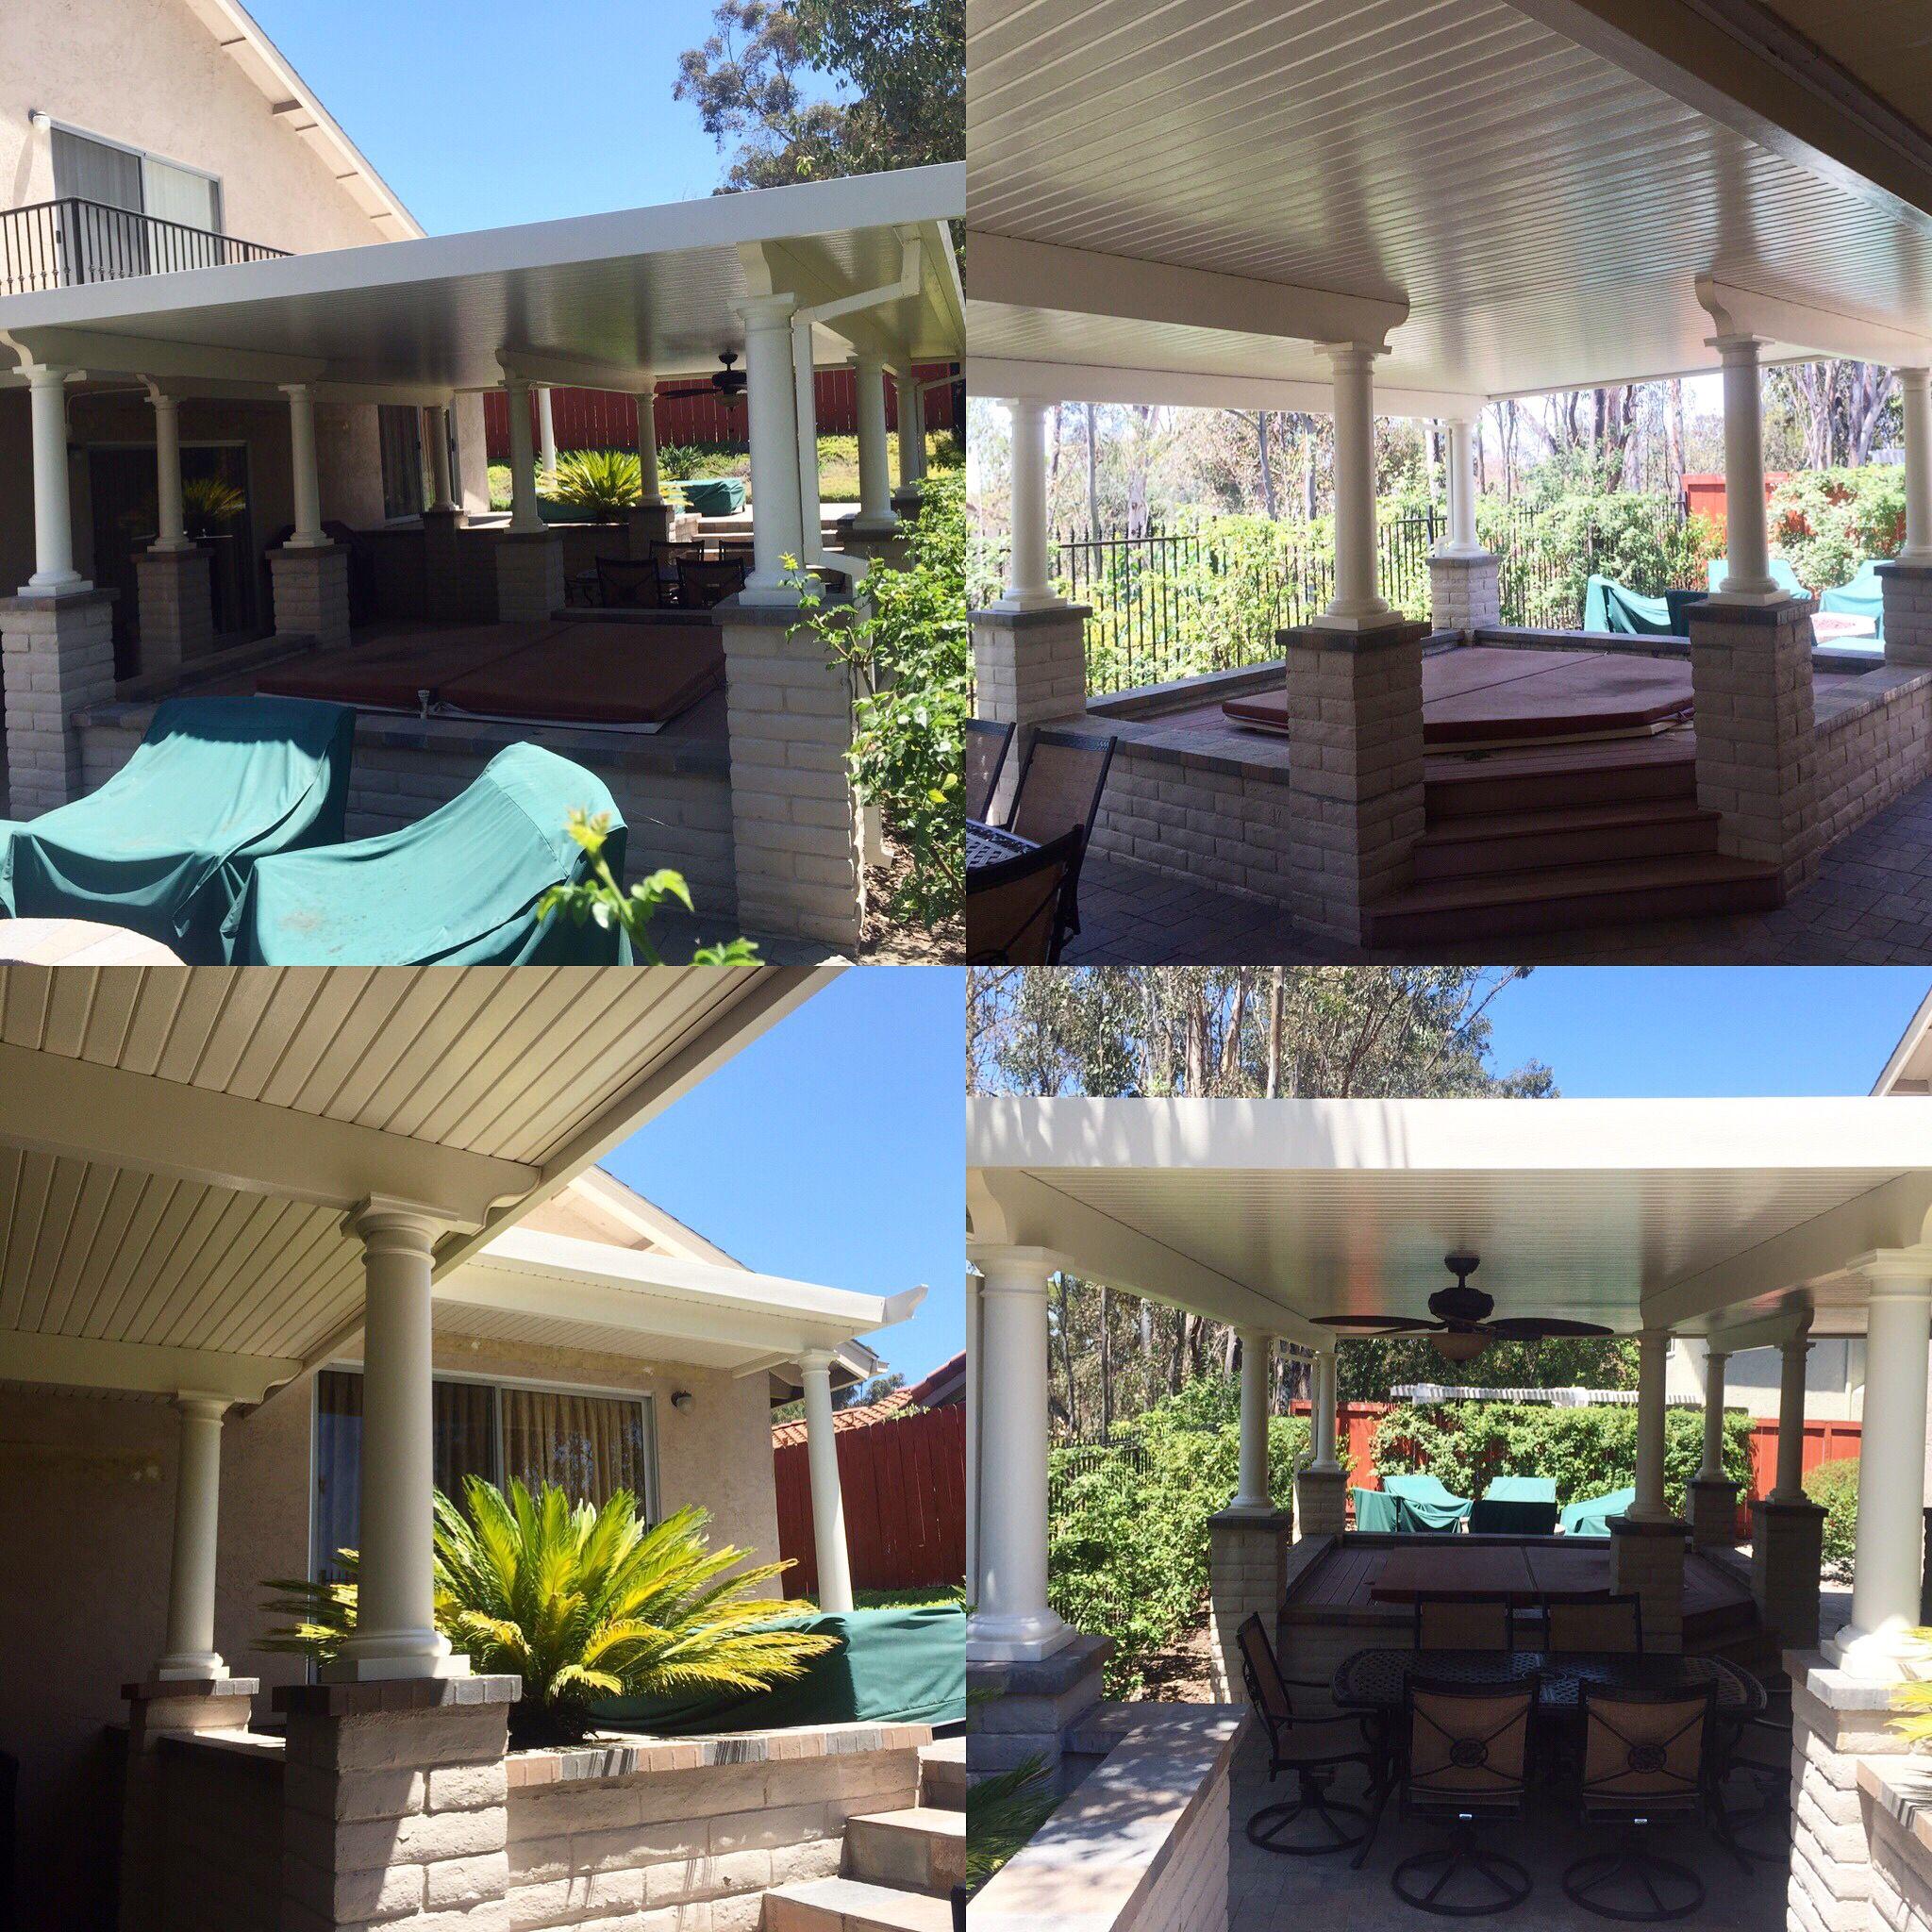 diy Alumawood patio cover kit Home remodel by PatioKitsDirect